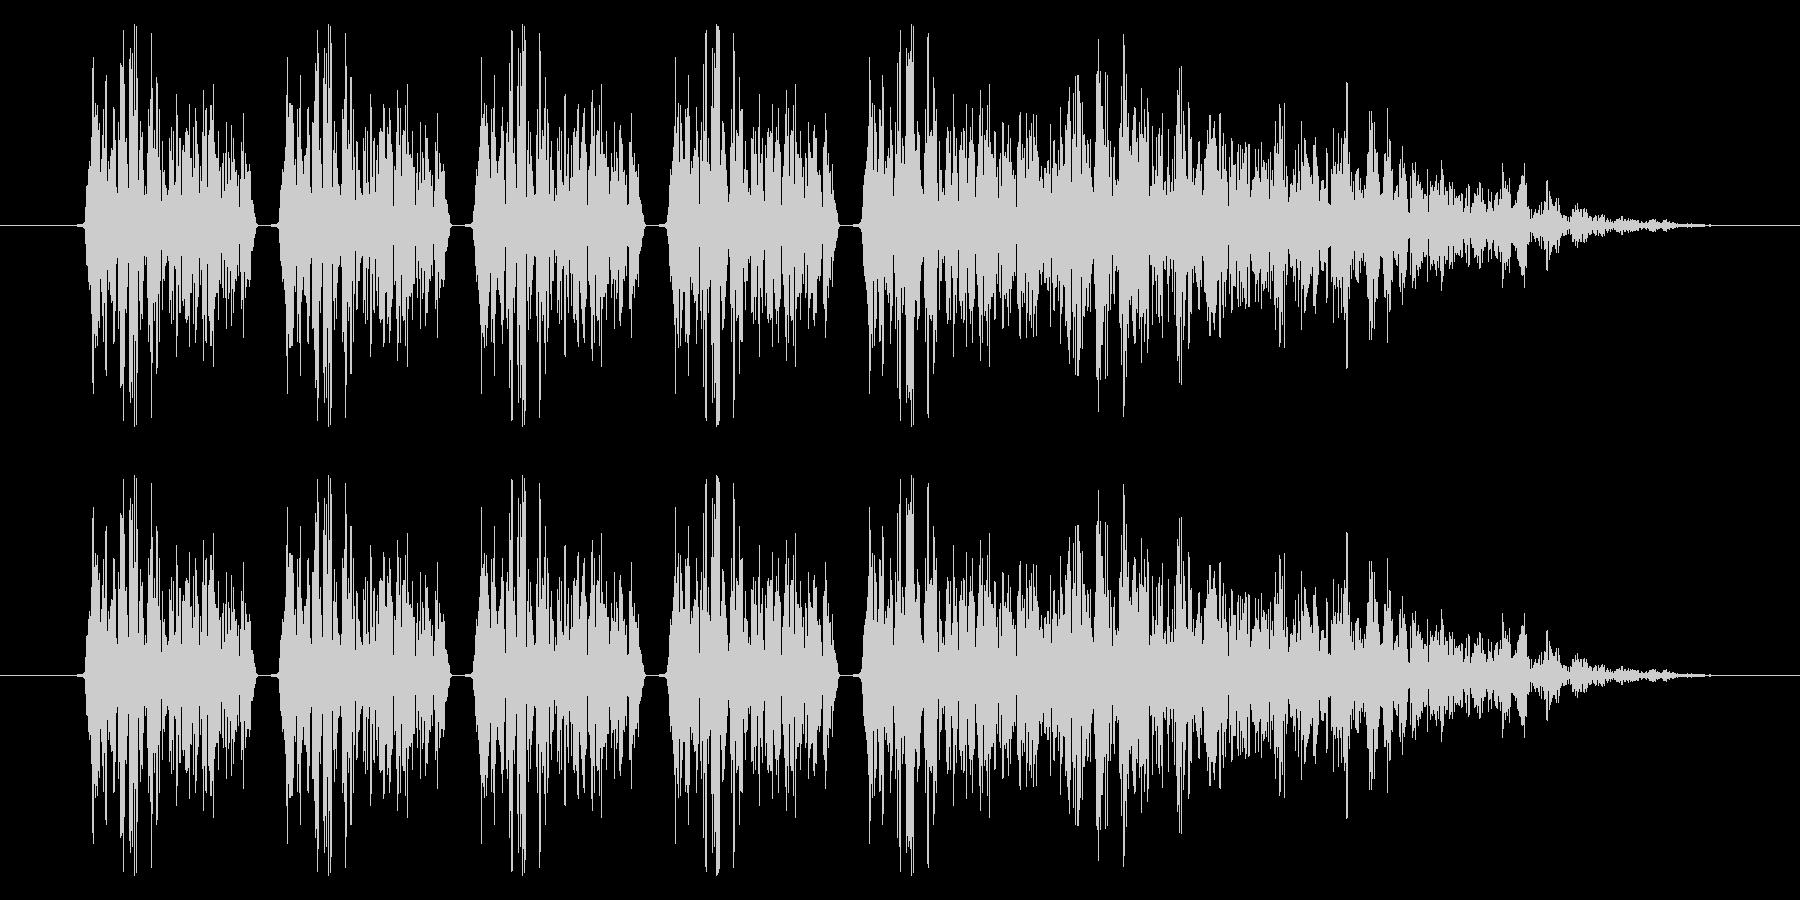 SNES シューティング02-11(ダメの未再生の波形